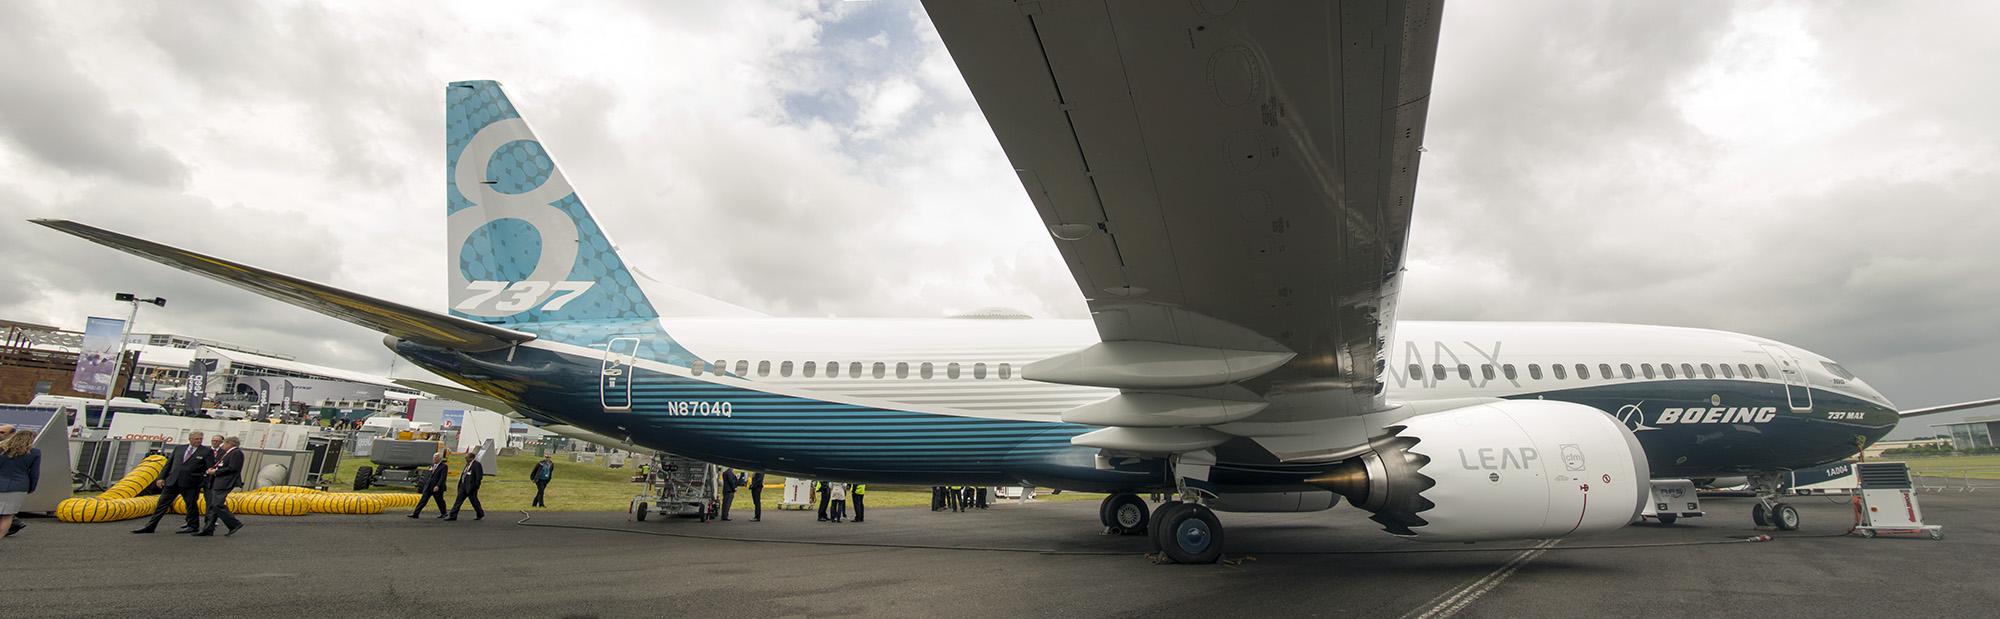 _IMG5516-5517-5518 Boeing 737-8 Max N8704Q Boeing company s